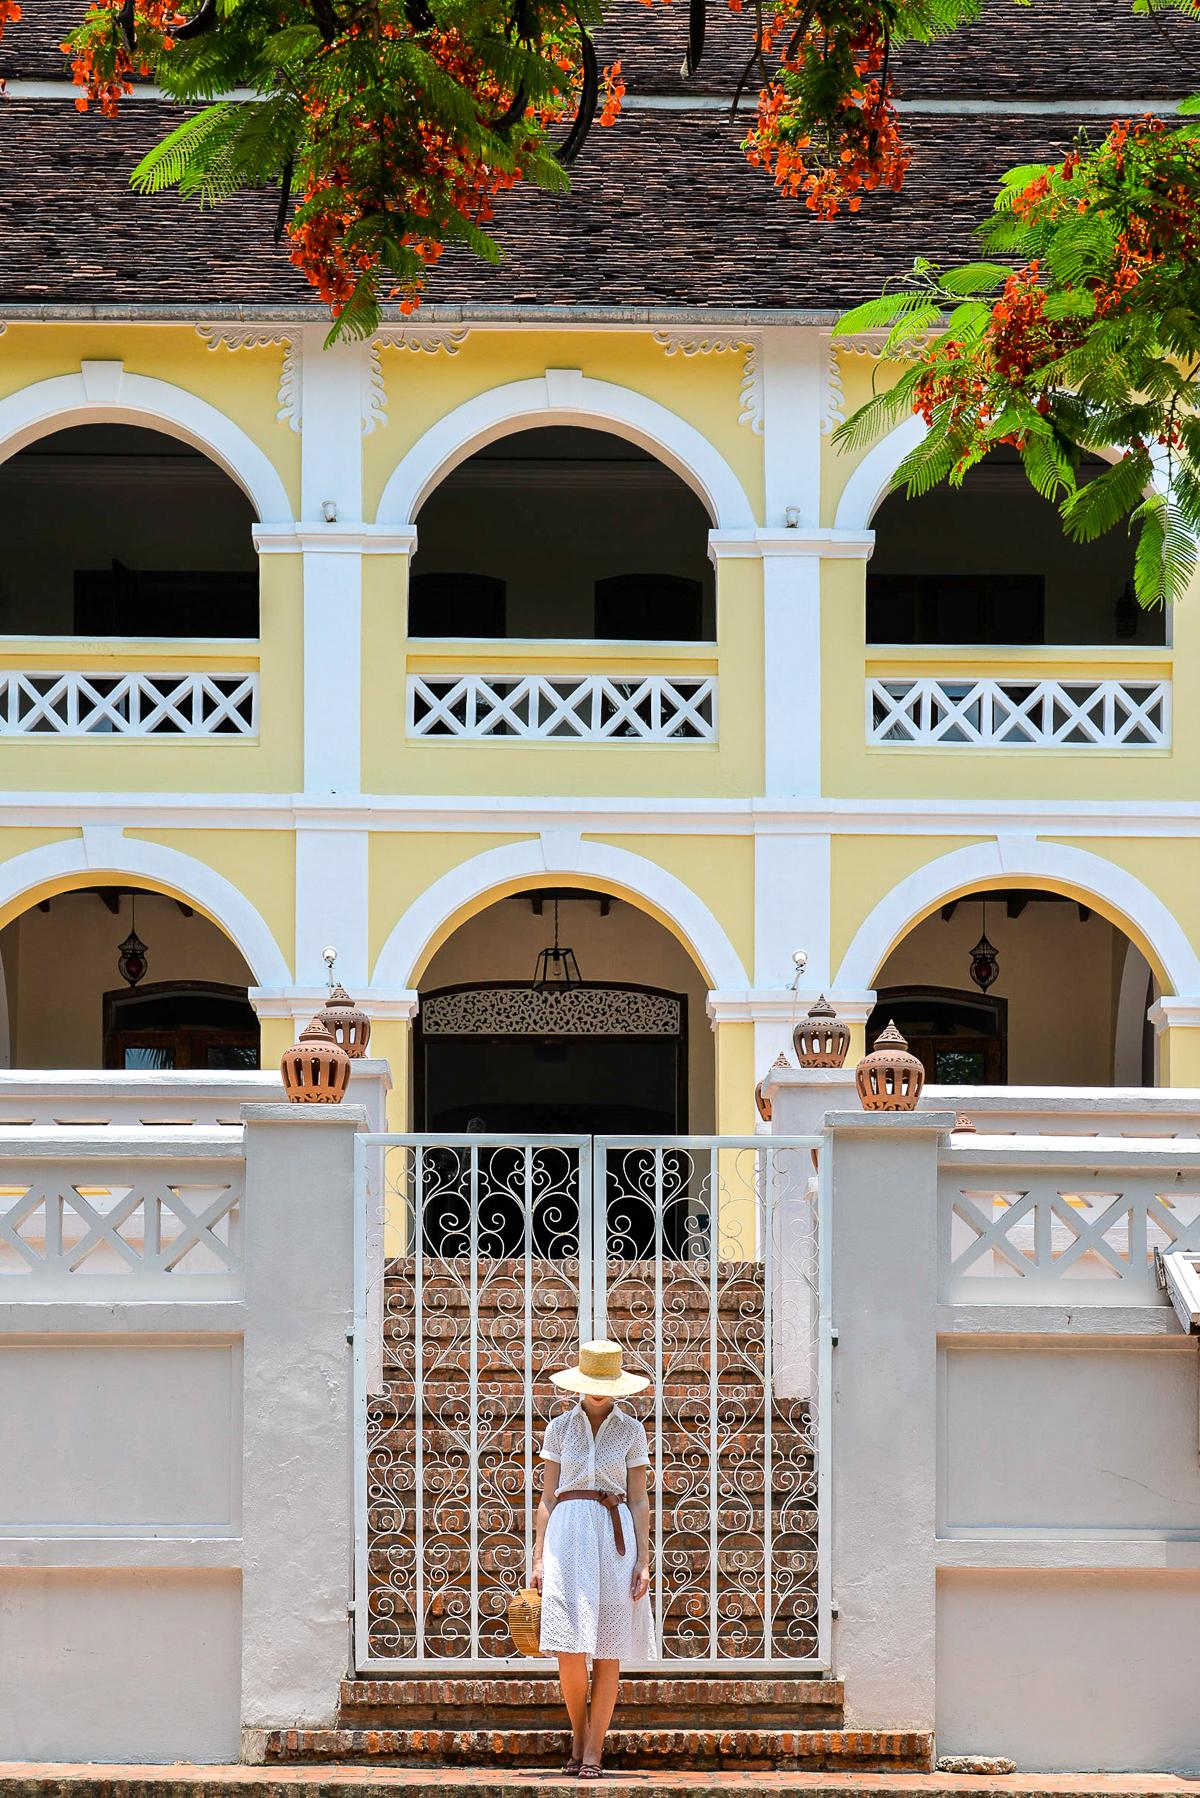 Stacie Flinner 3 Nagas Complete Guide to Luang Prabang-125.jpg